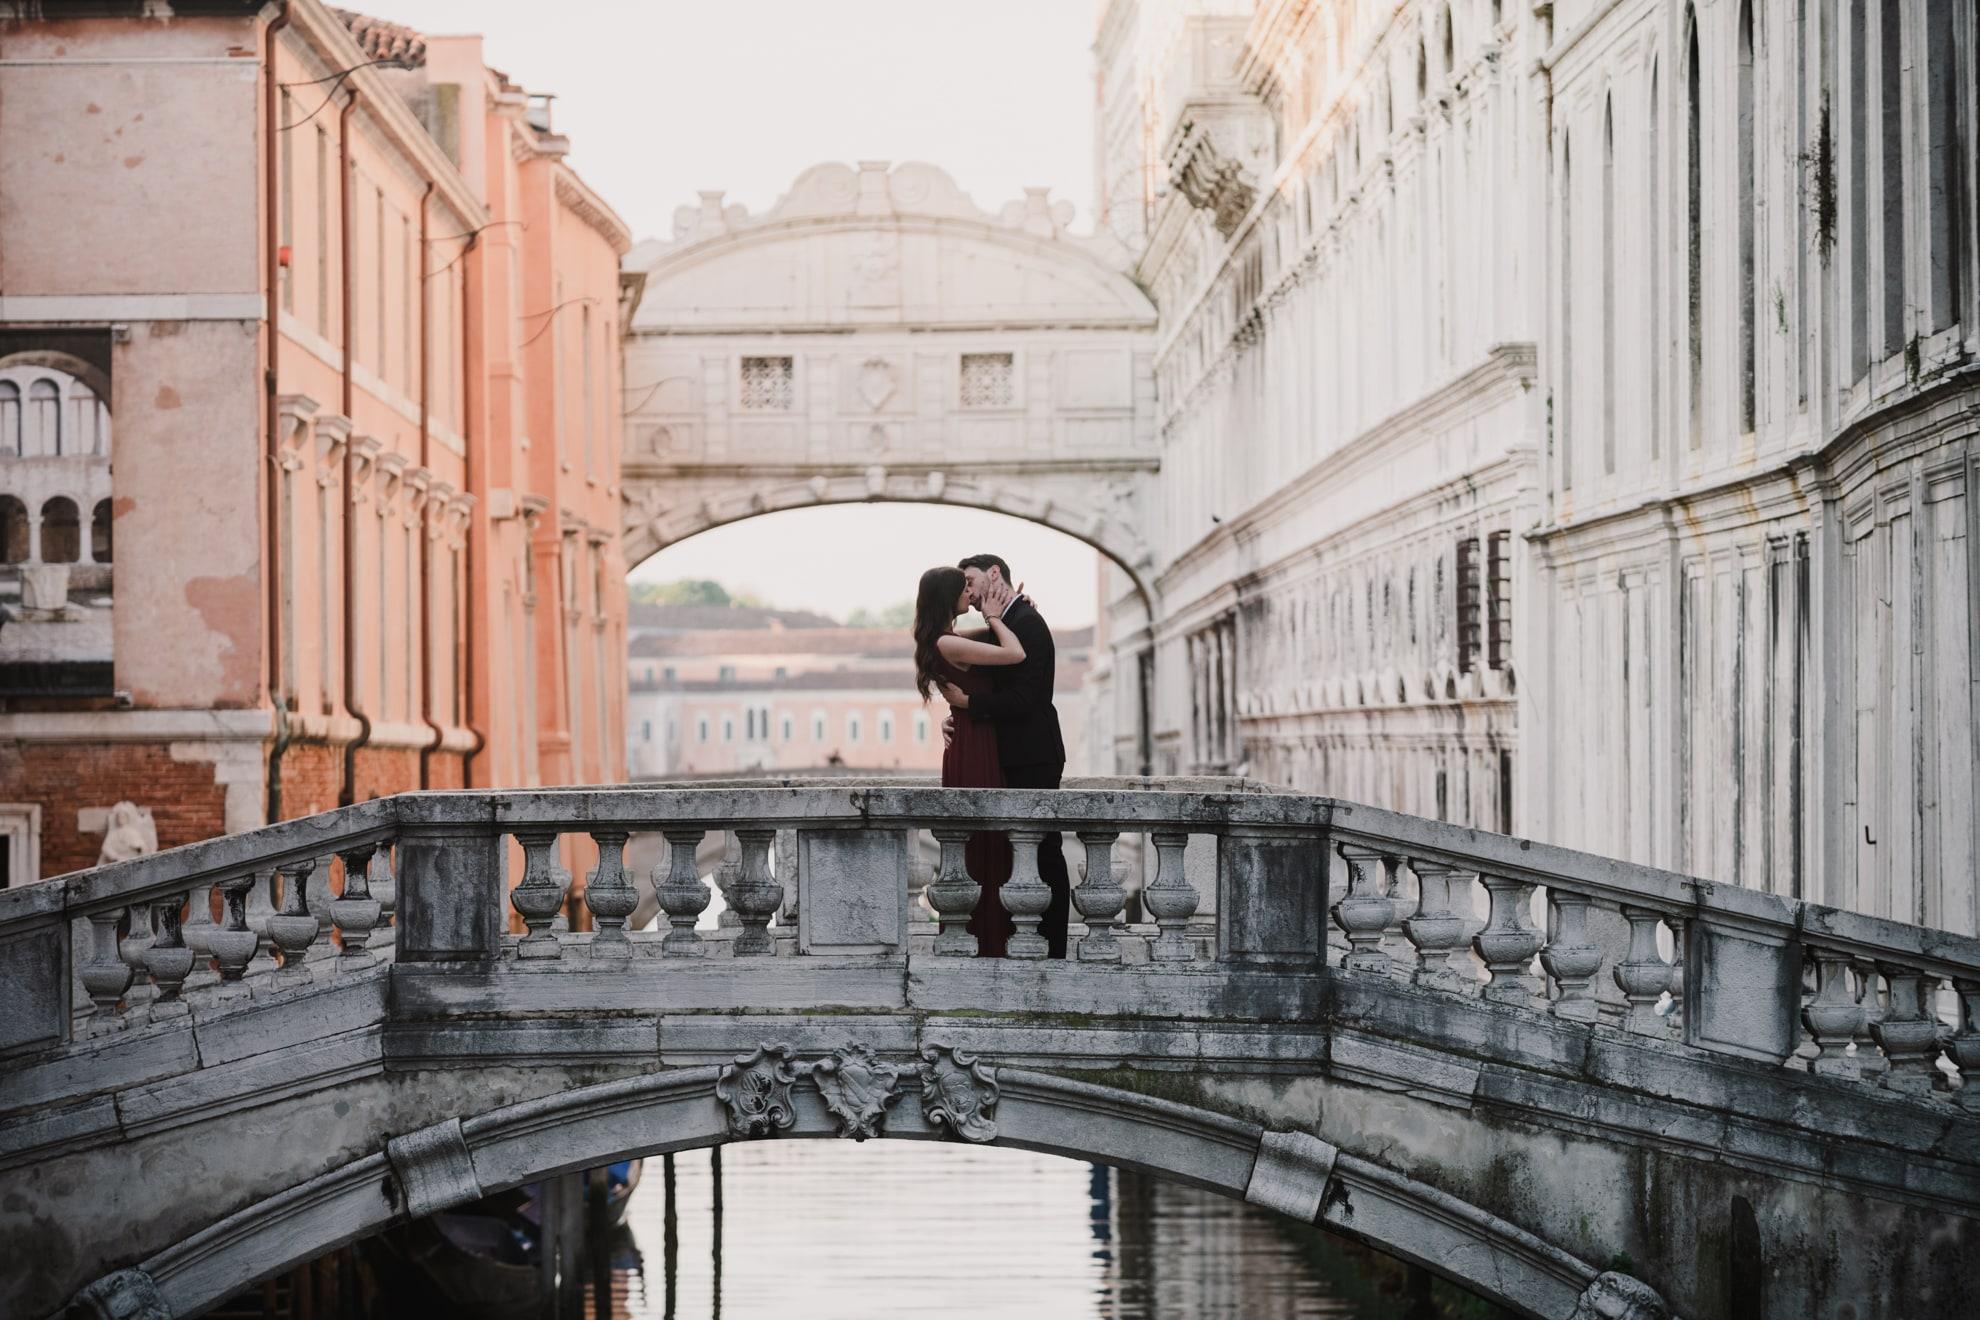 engagement venice venezia proposal proposta matrimonio fidanzamento irene pollacchi fotografa 24